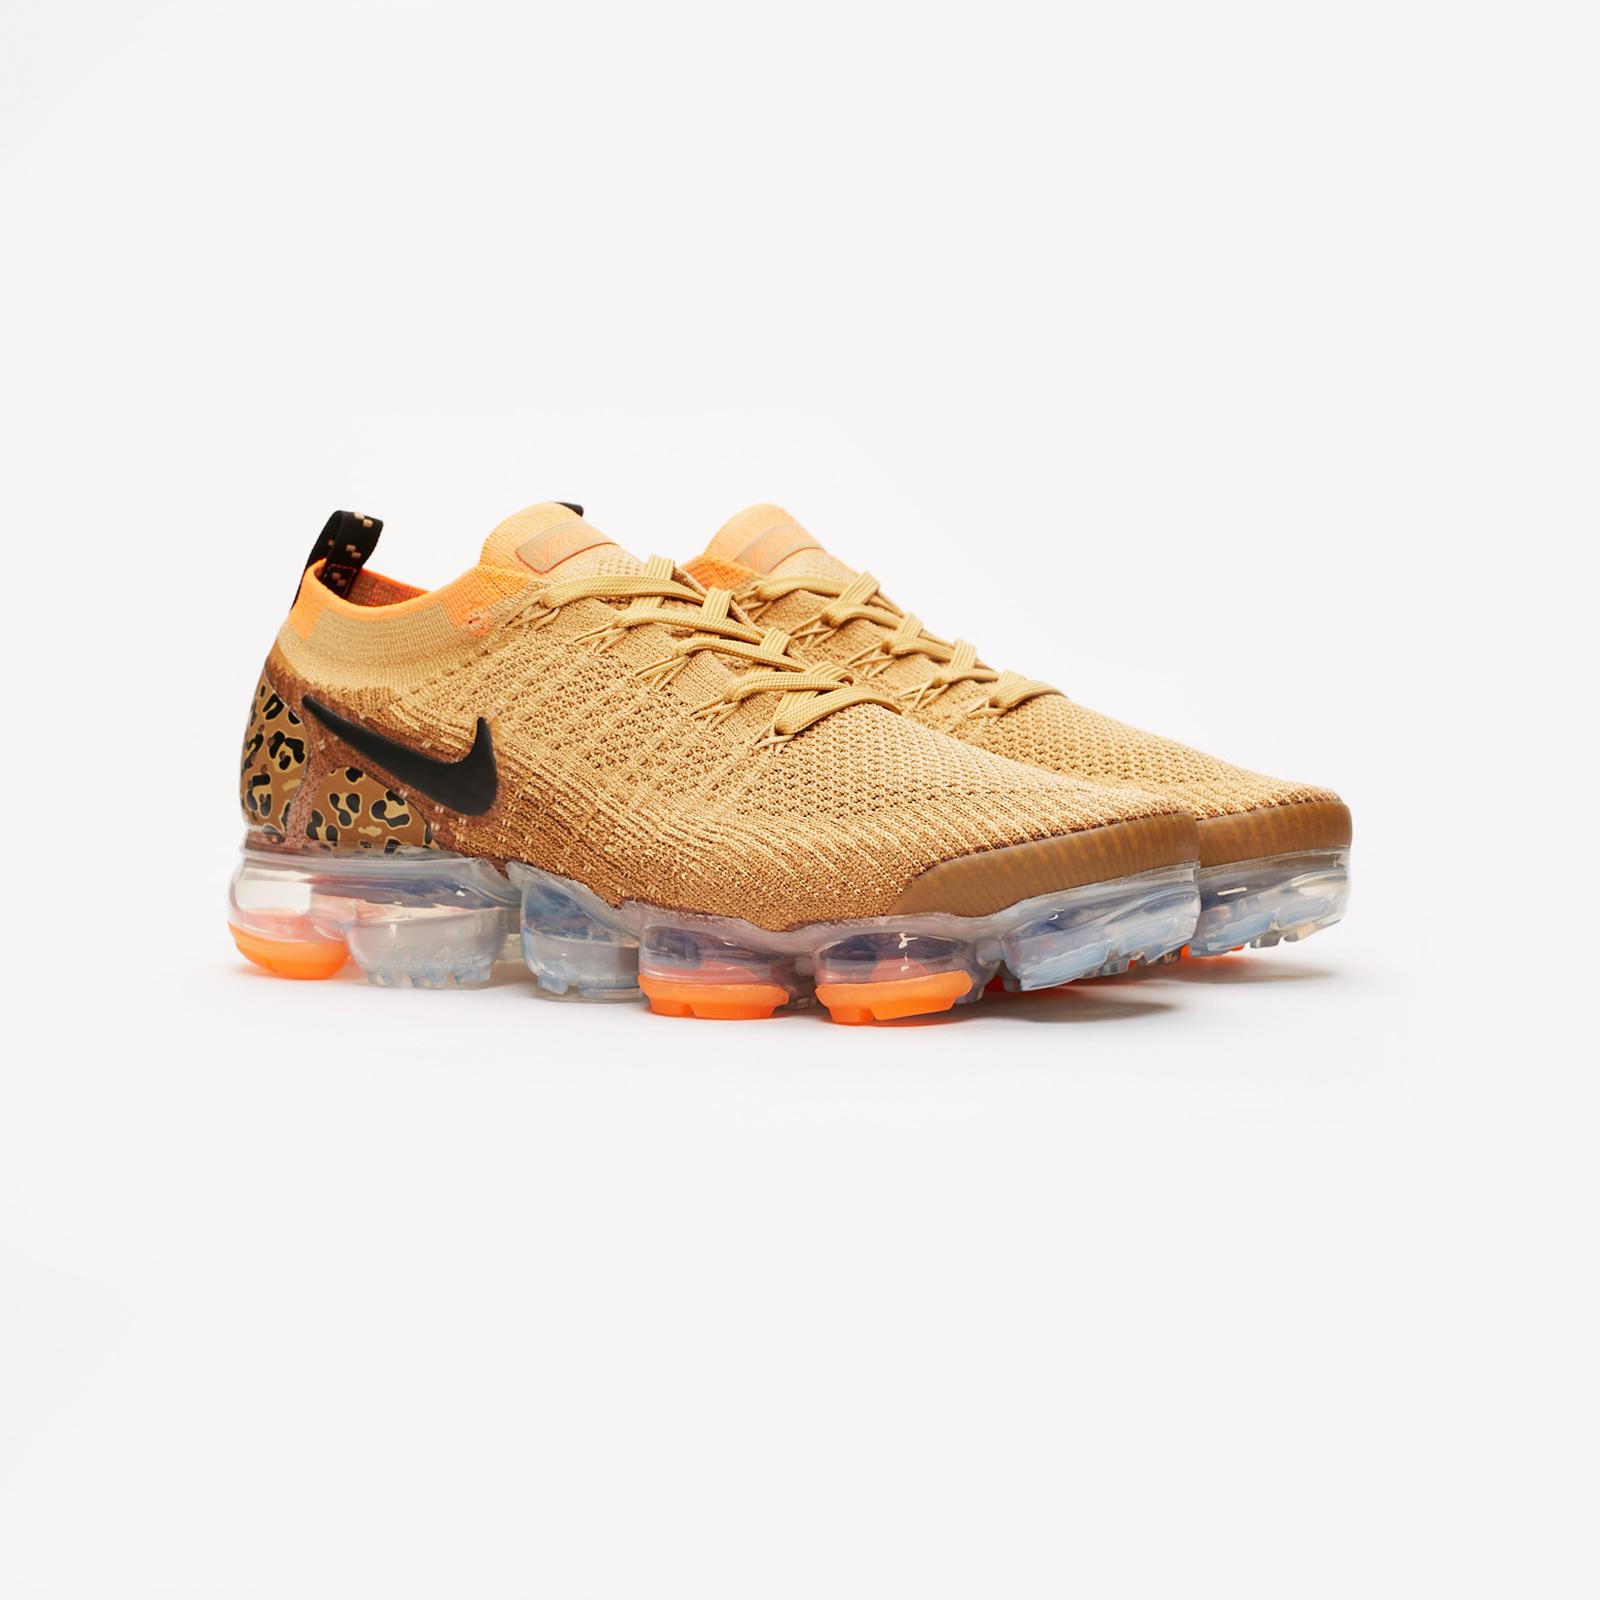 de5197baa7bb2 Nike Air Vapormax Flyknit 2 - Av7973-700 - Sneakersnstuff